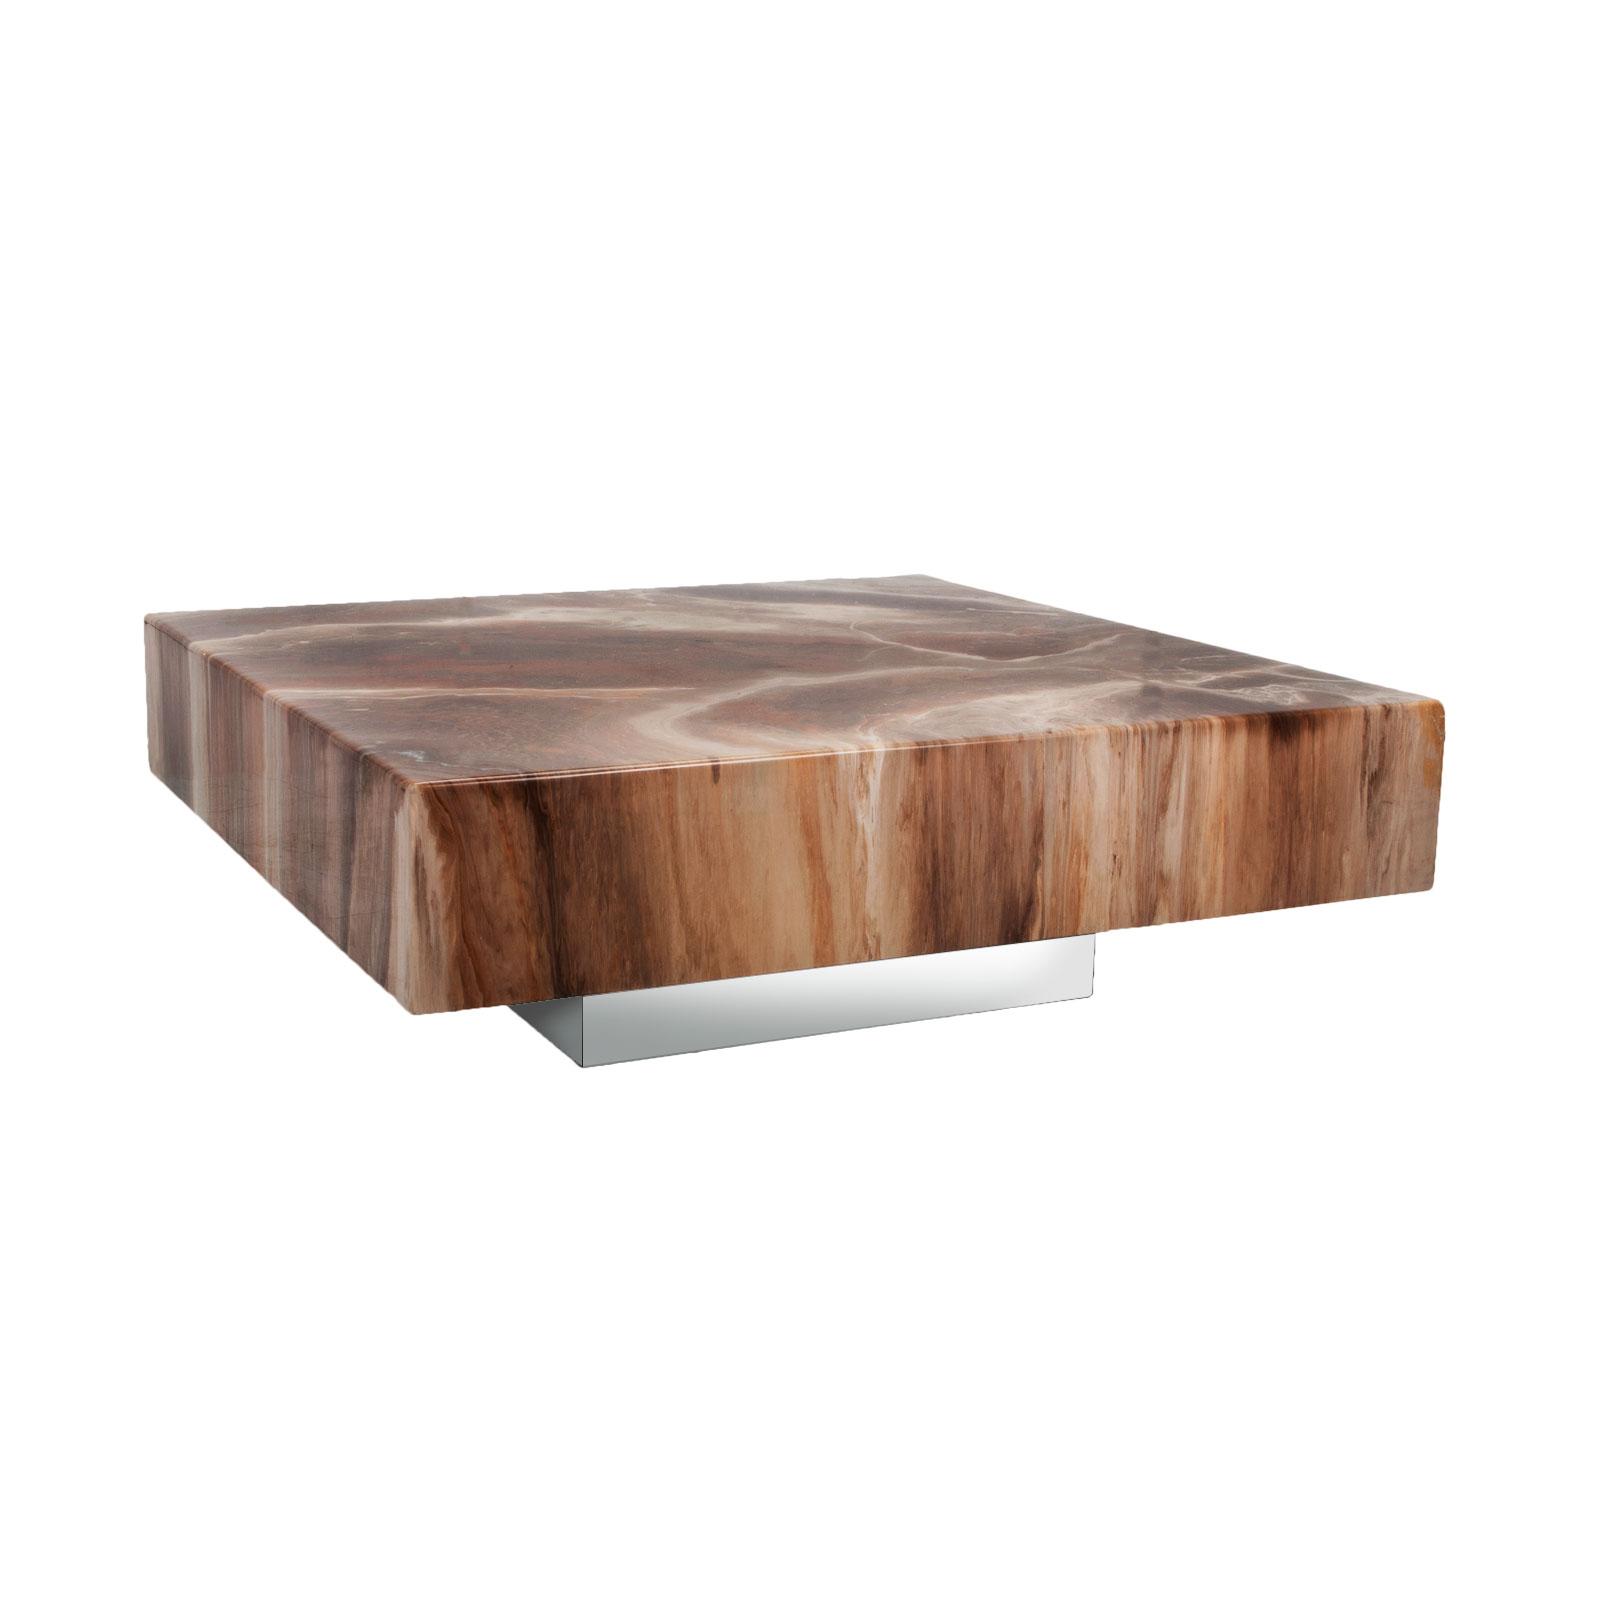 miniature furniture cardboardwood routers. Milo Baughman Furniture. Furniture E Miniature Cardboardwood Routers